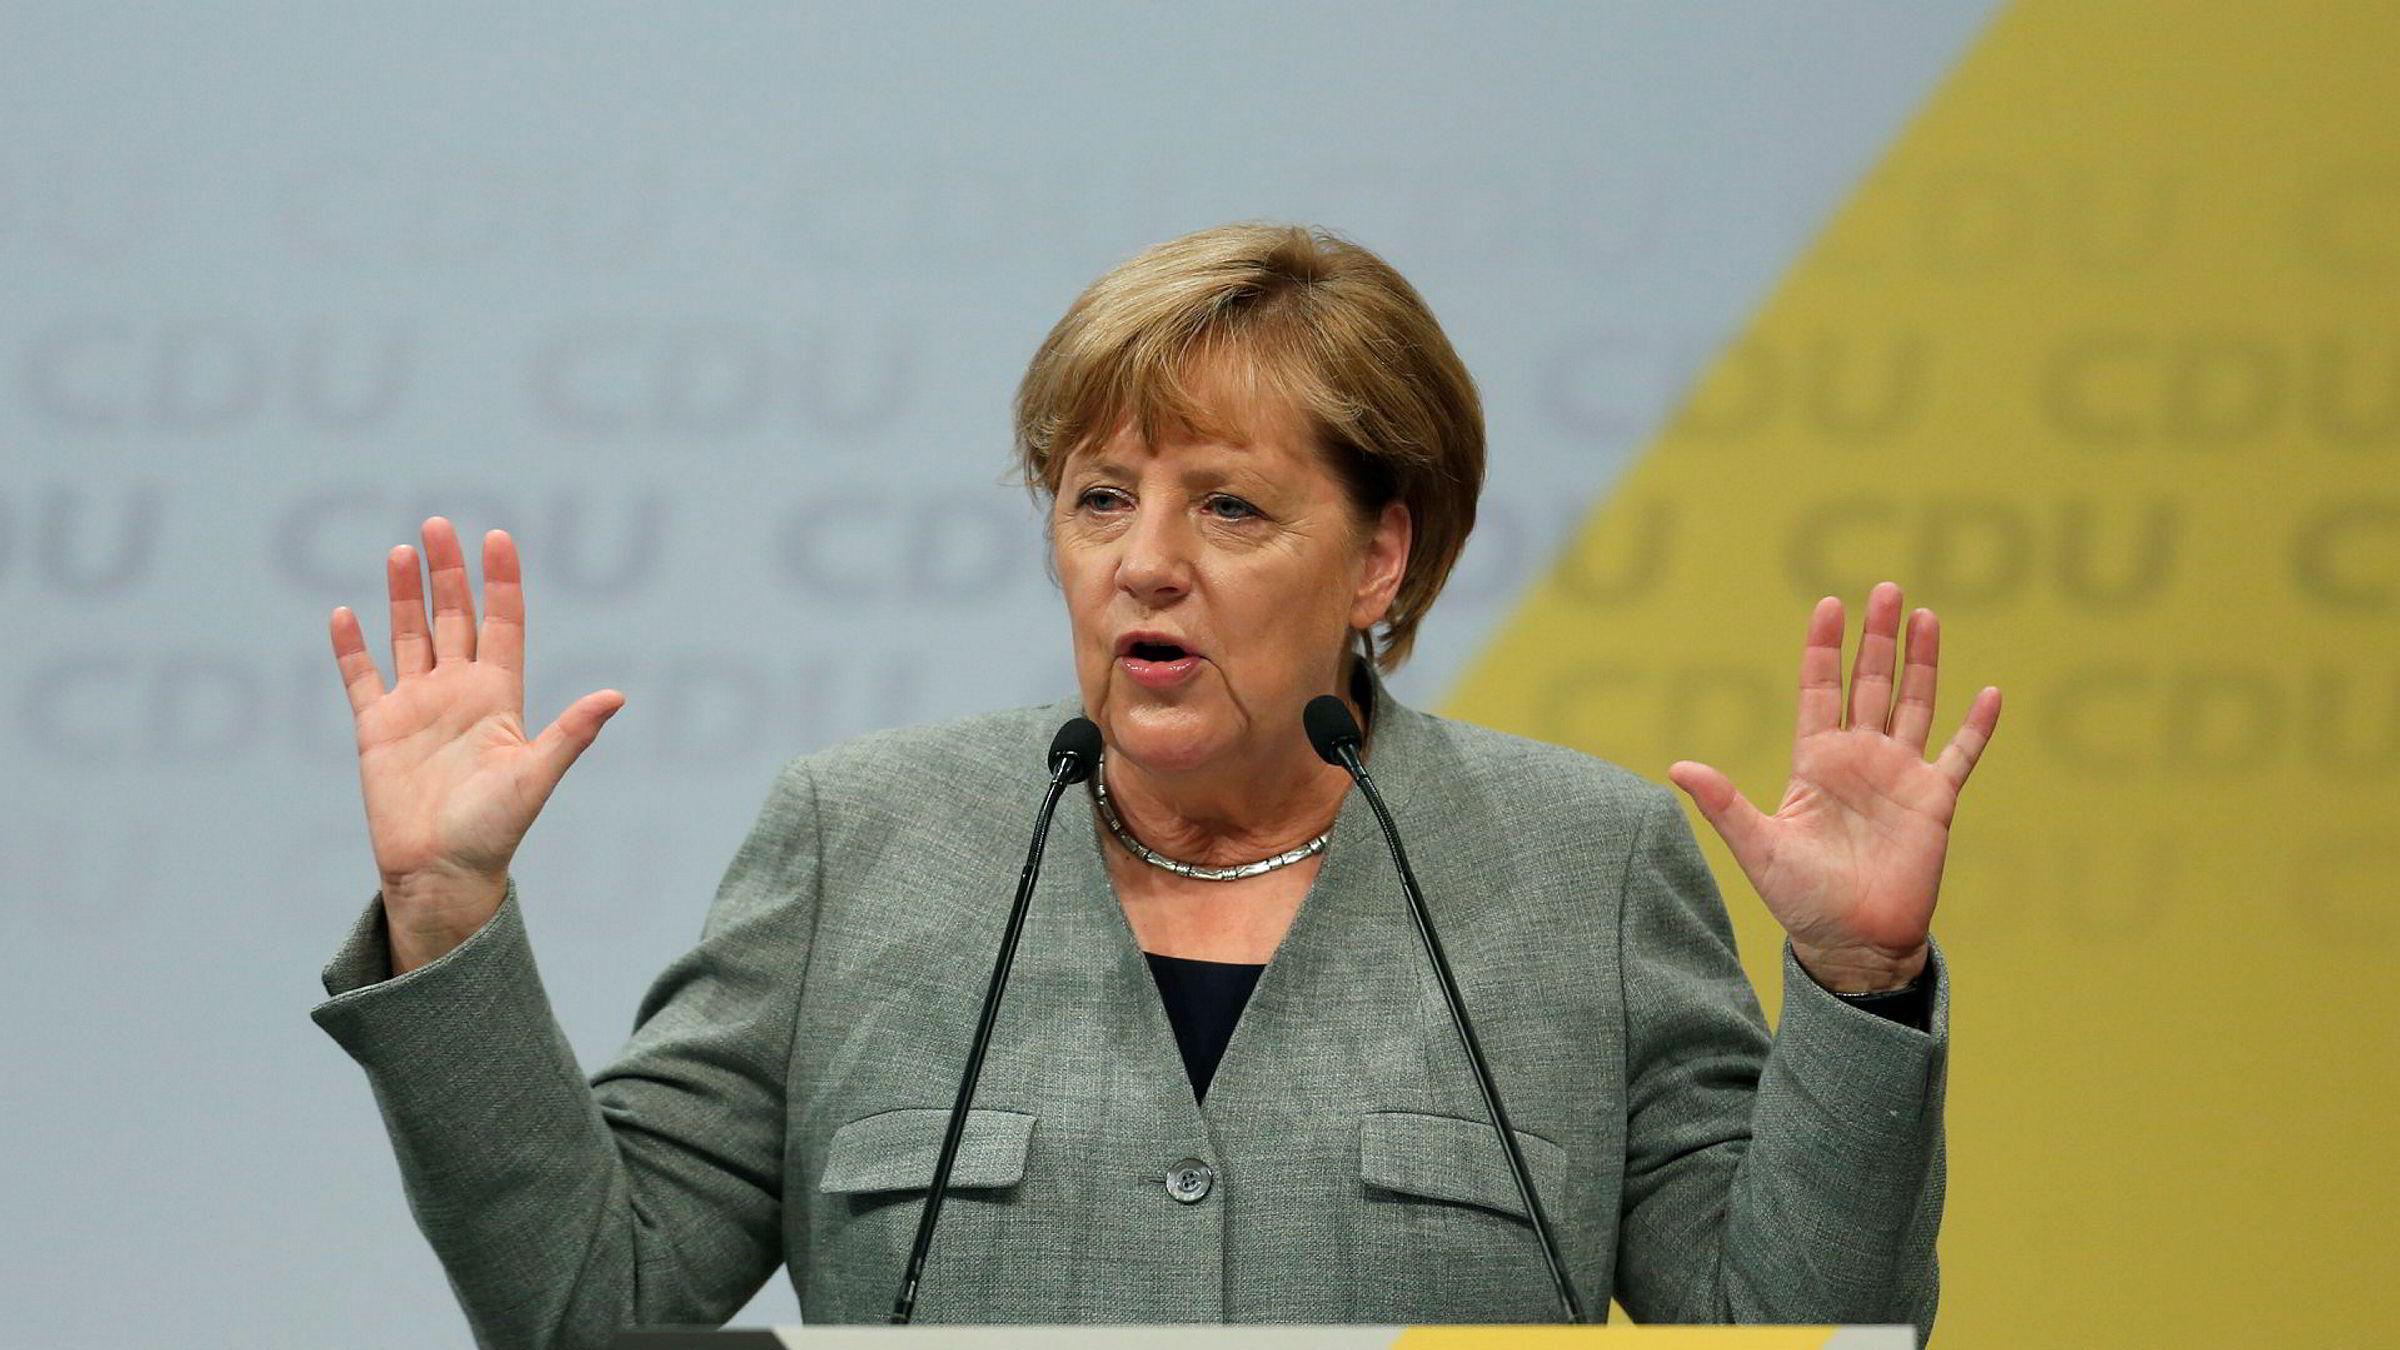 Forbundskansler Angela Merkel holdt en tale i Tyskland lørdag. Der kom hun blant annet med et ultimatum til den kontroversielle bilindustrien i landet.